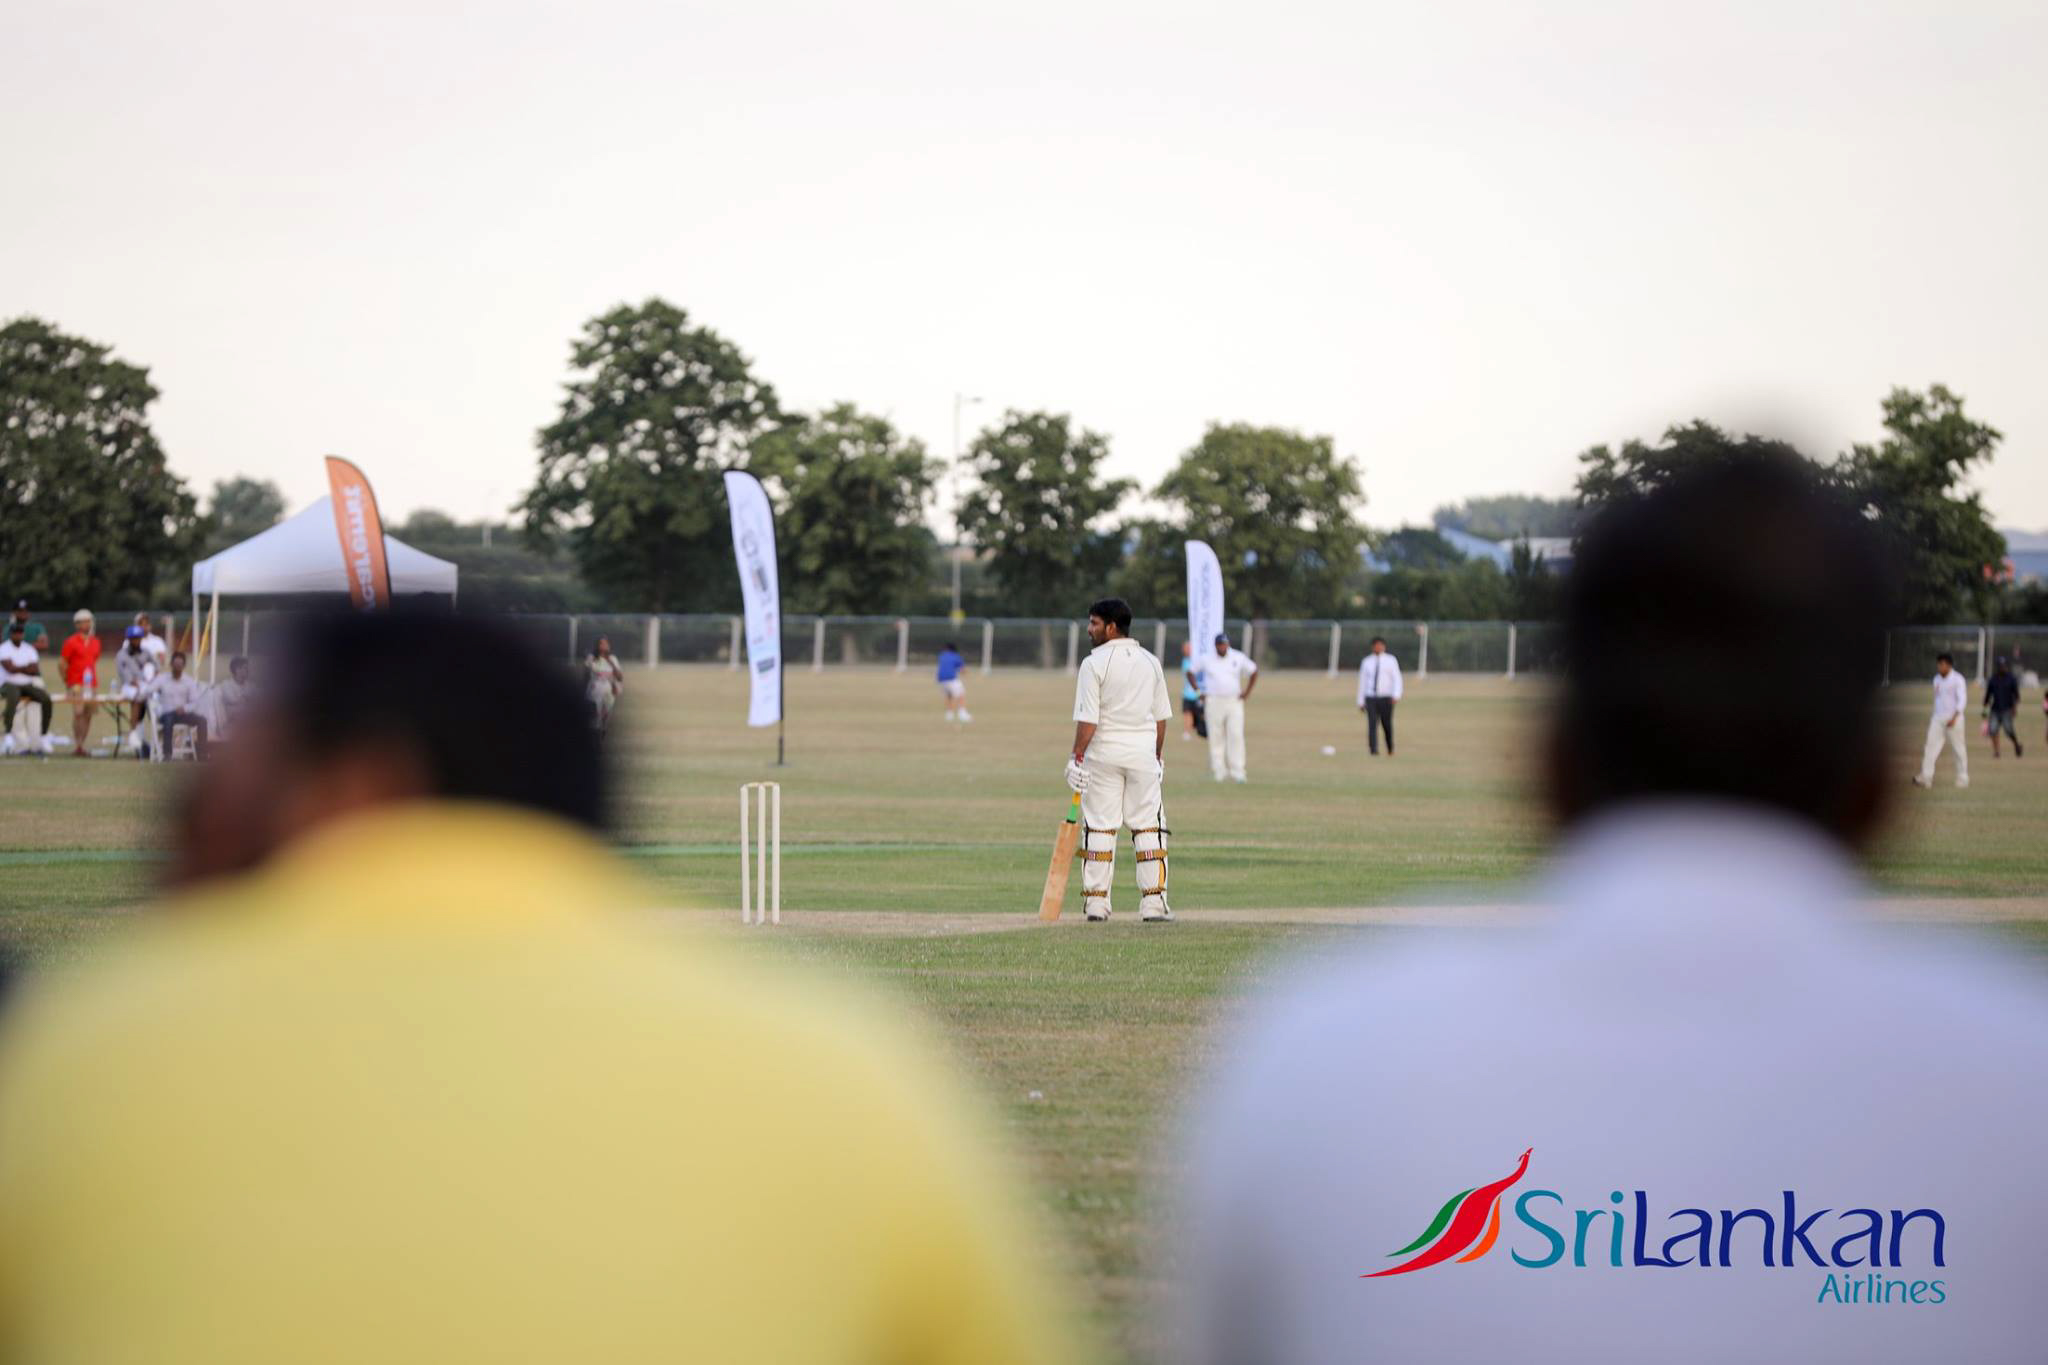 Sri-Lankan-airlines-cricket-festival-london-2017-natalia-smith--photography-21.jpg